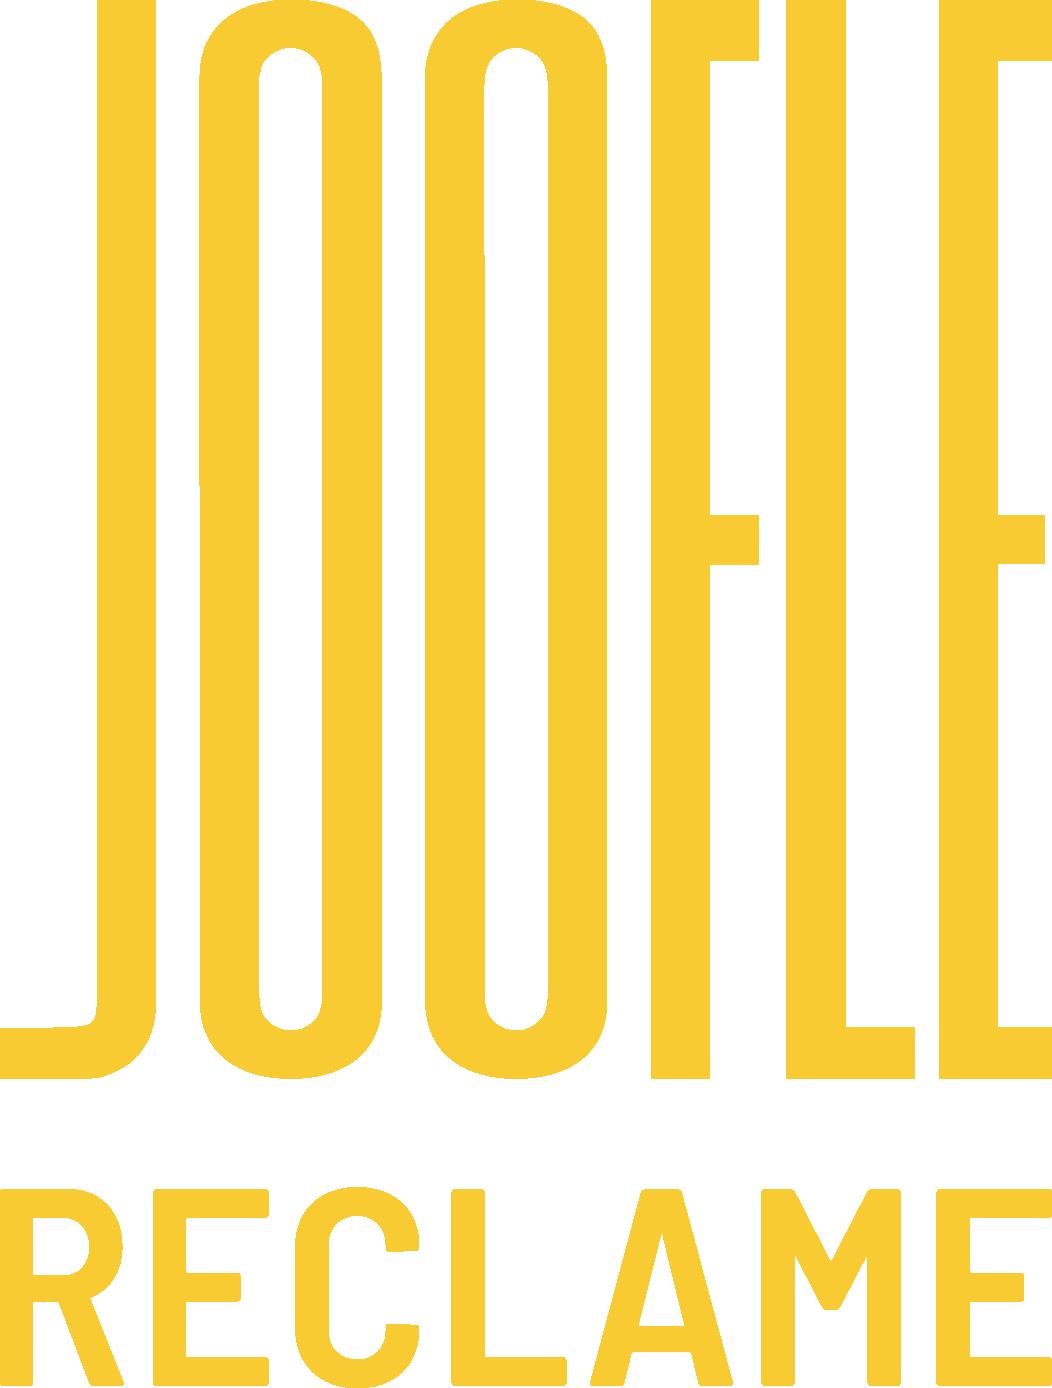 Joofle Brand Reclame Logo Geel